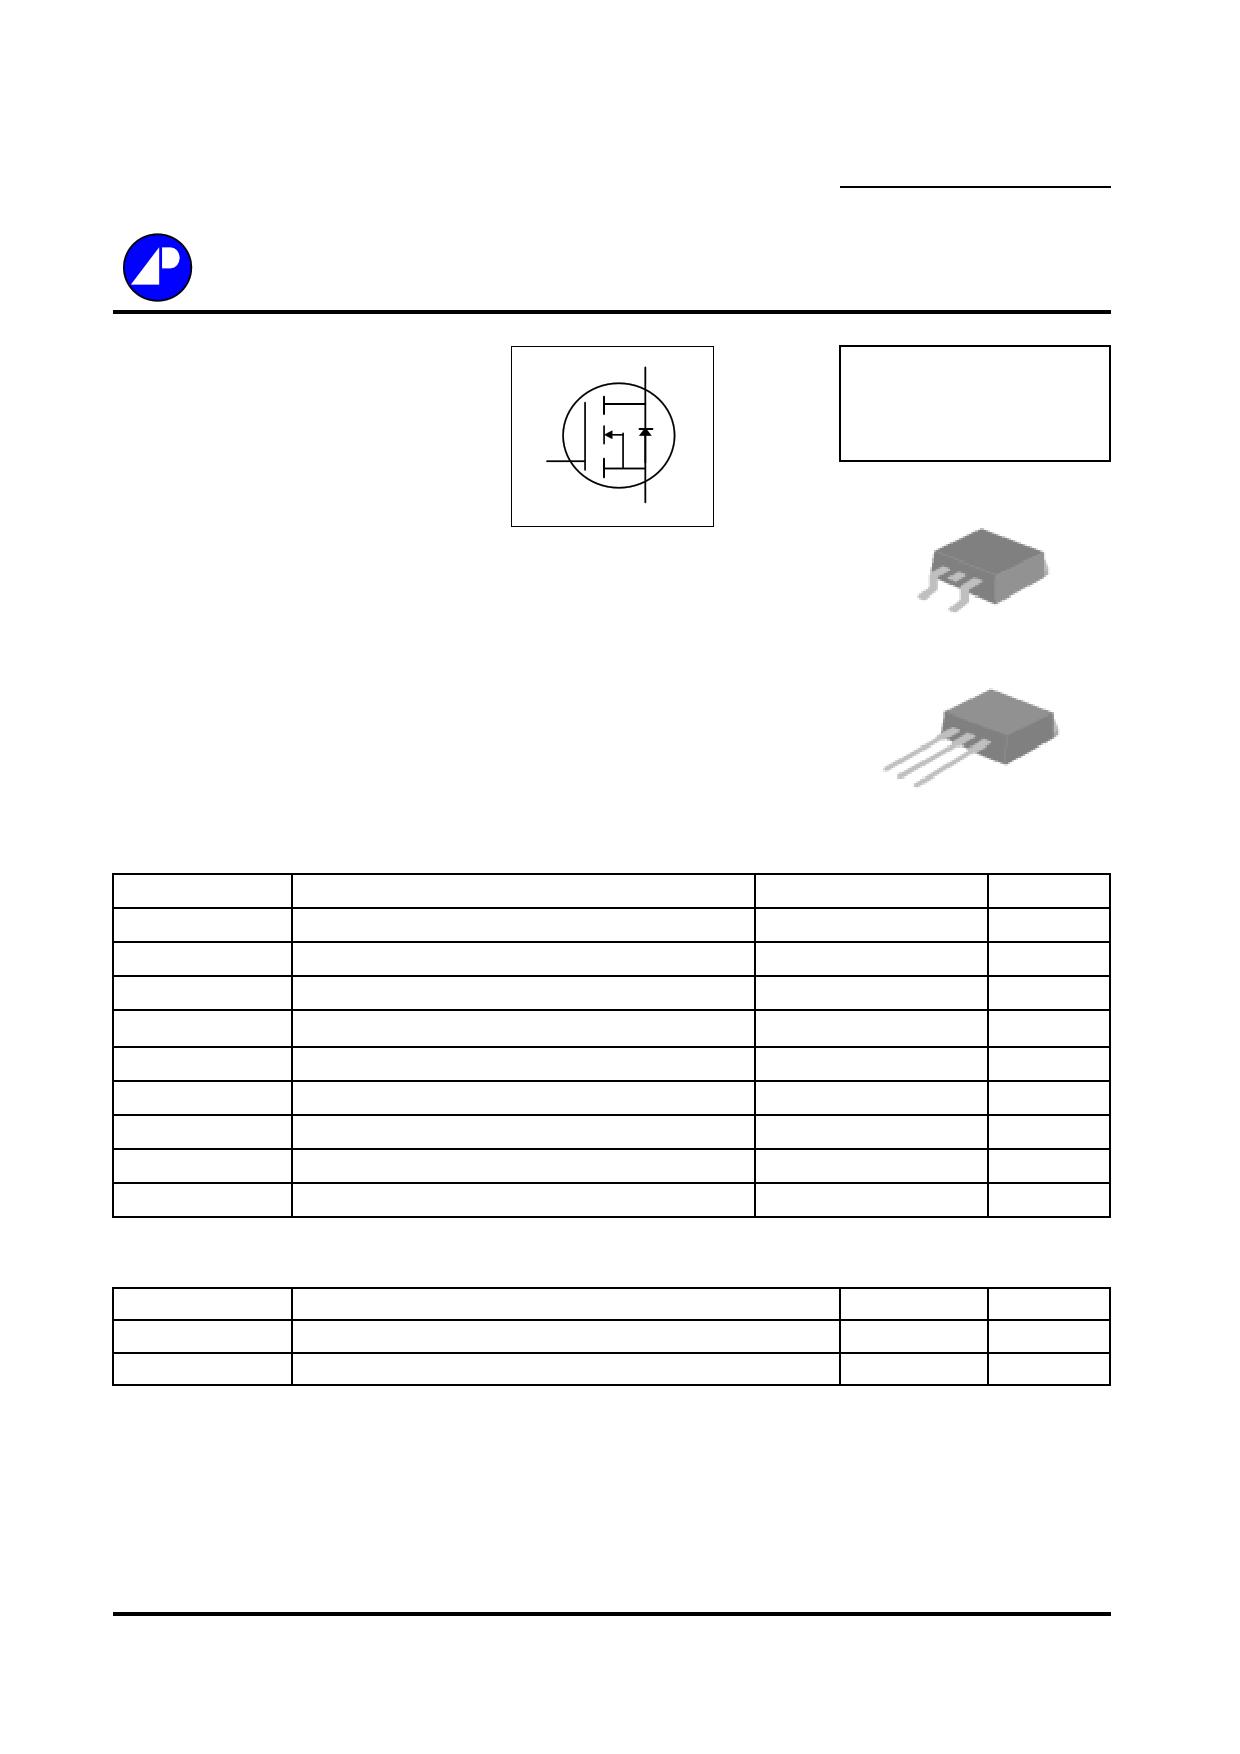 9916H datasheet image